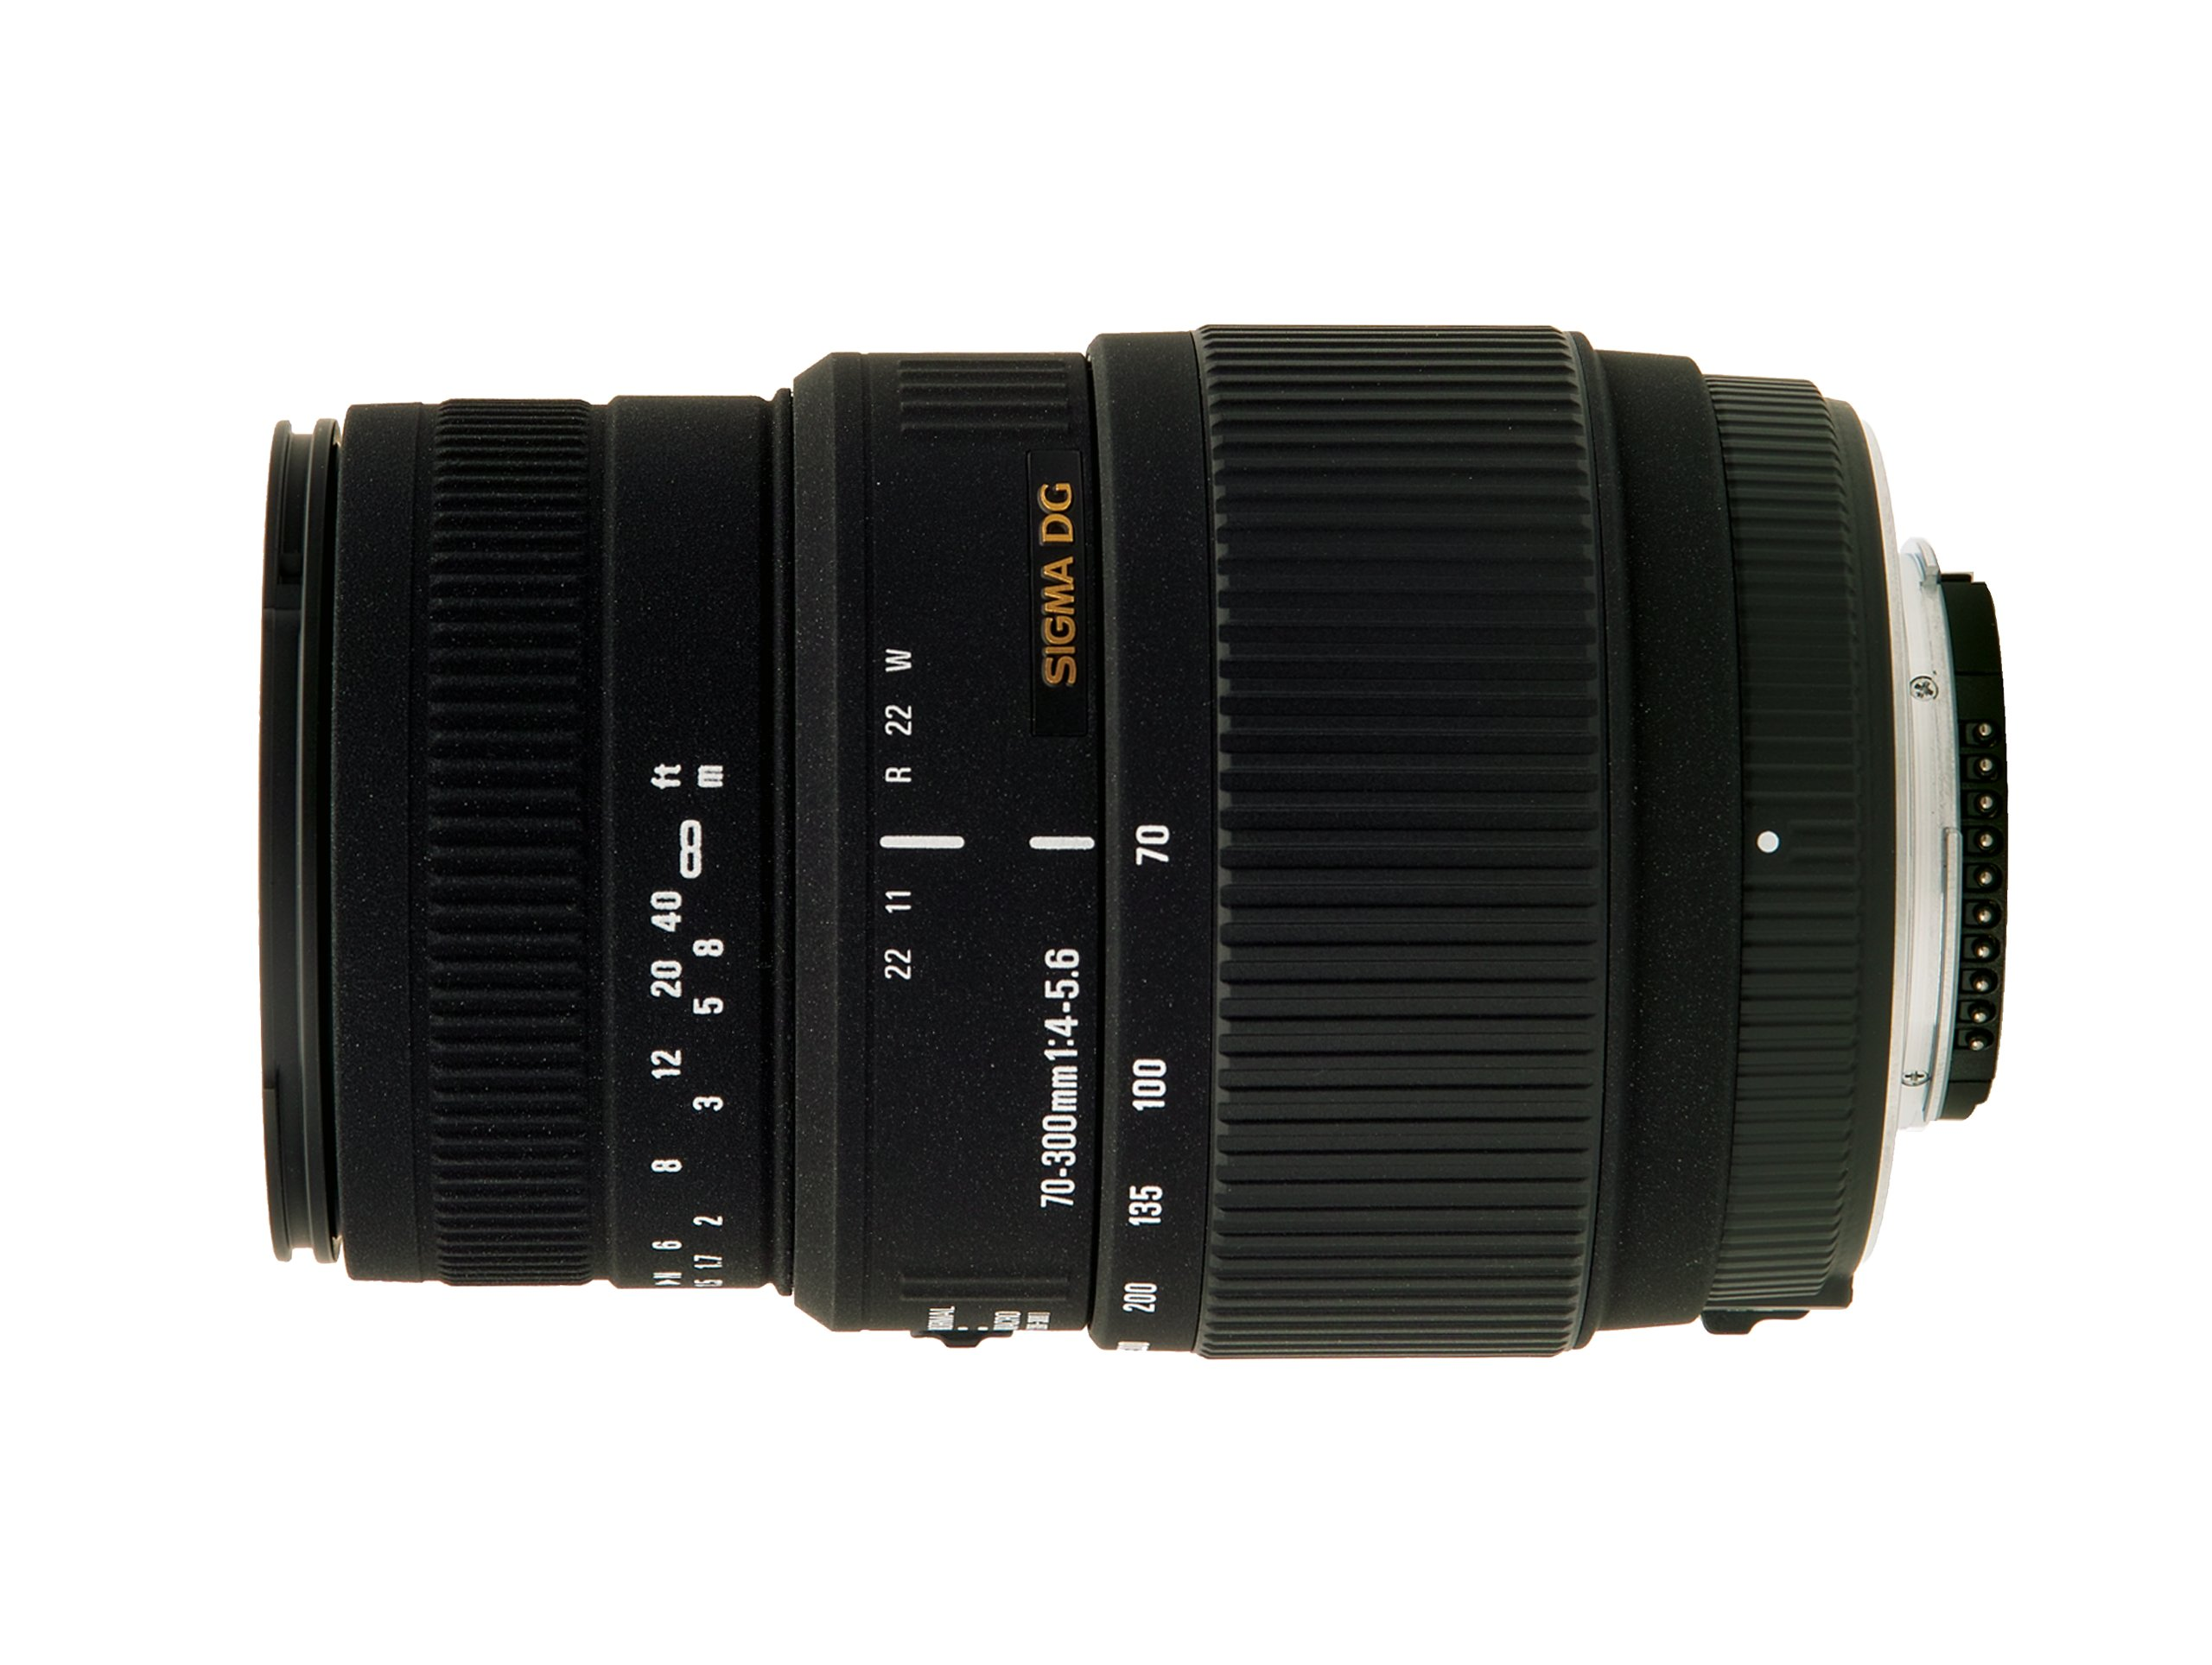 Sigma 70-300mm f/4-5.6 DG Macro Motorized Telephoto Zoom Lens for Nikon Digital SLR Cameras by Sigma (Image #4)